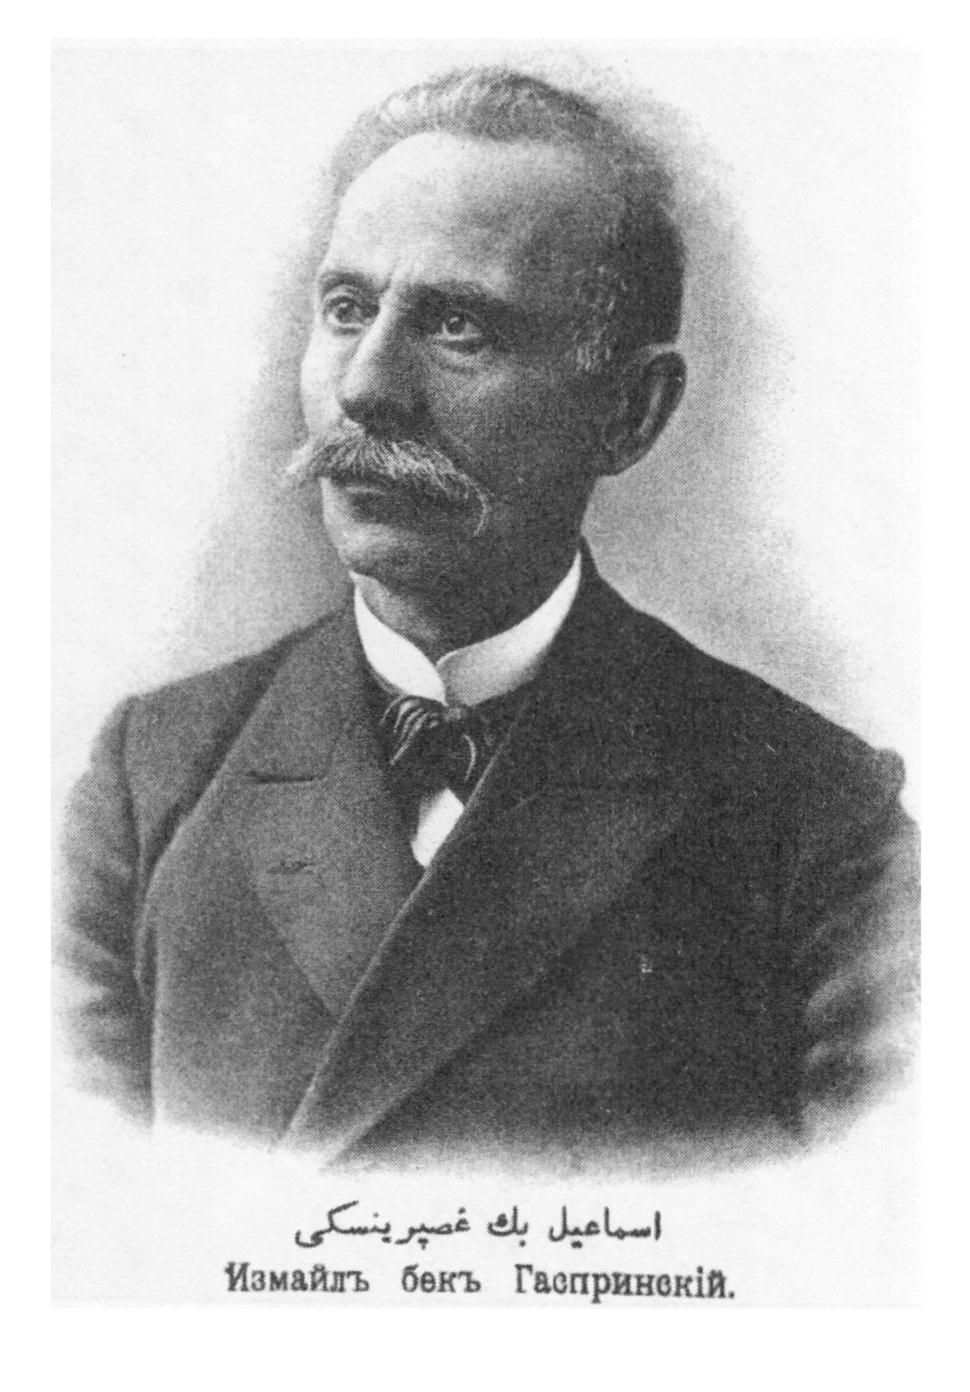 Ismail Bey Gaspirali, ou Ismail Gasprinsky (1851-1914), jadidista